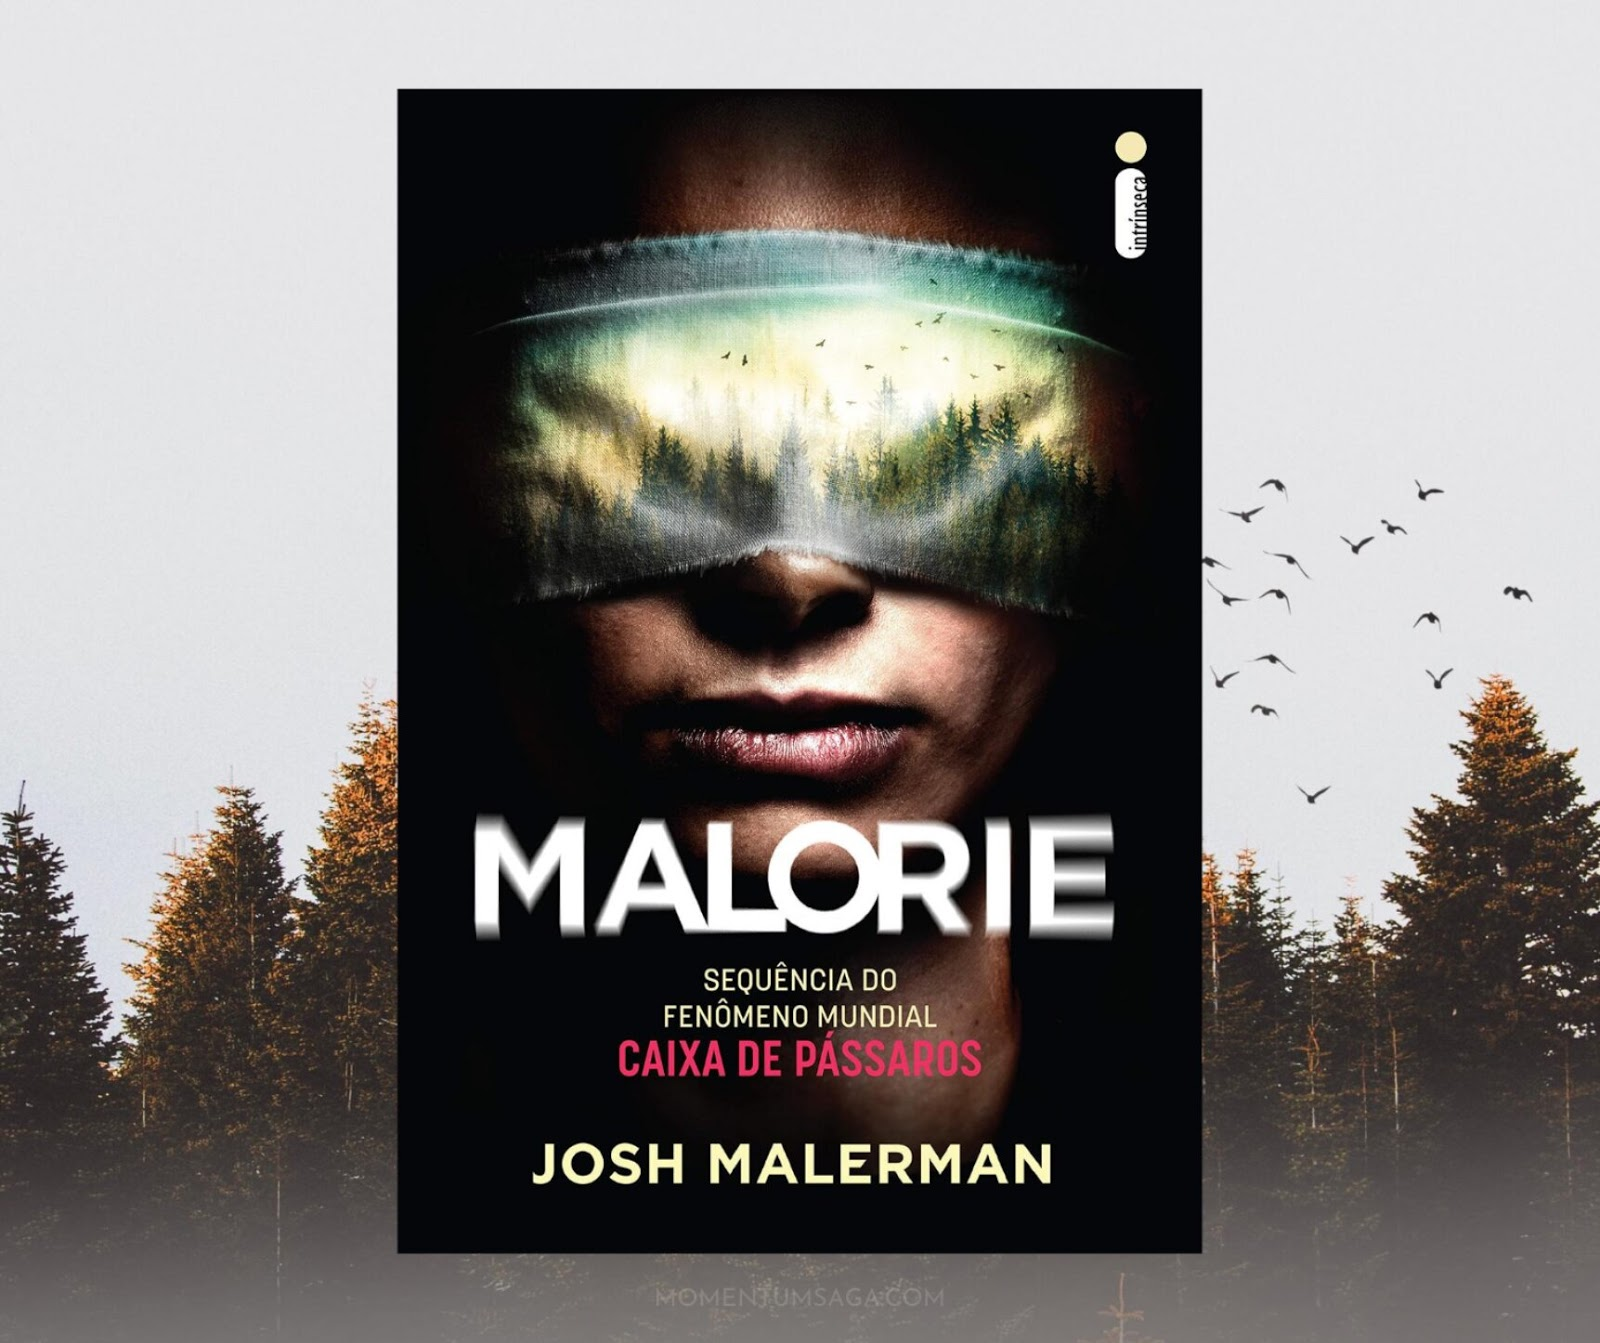 Resenha: Malorie, de Josh Malerman